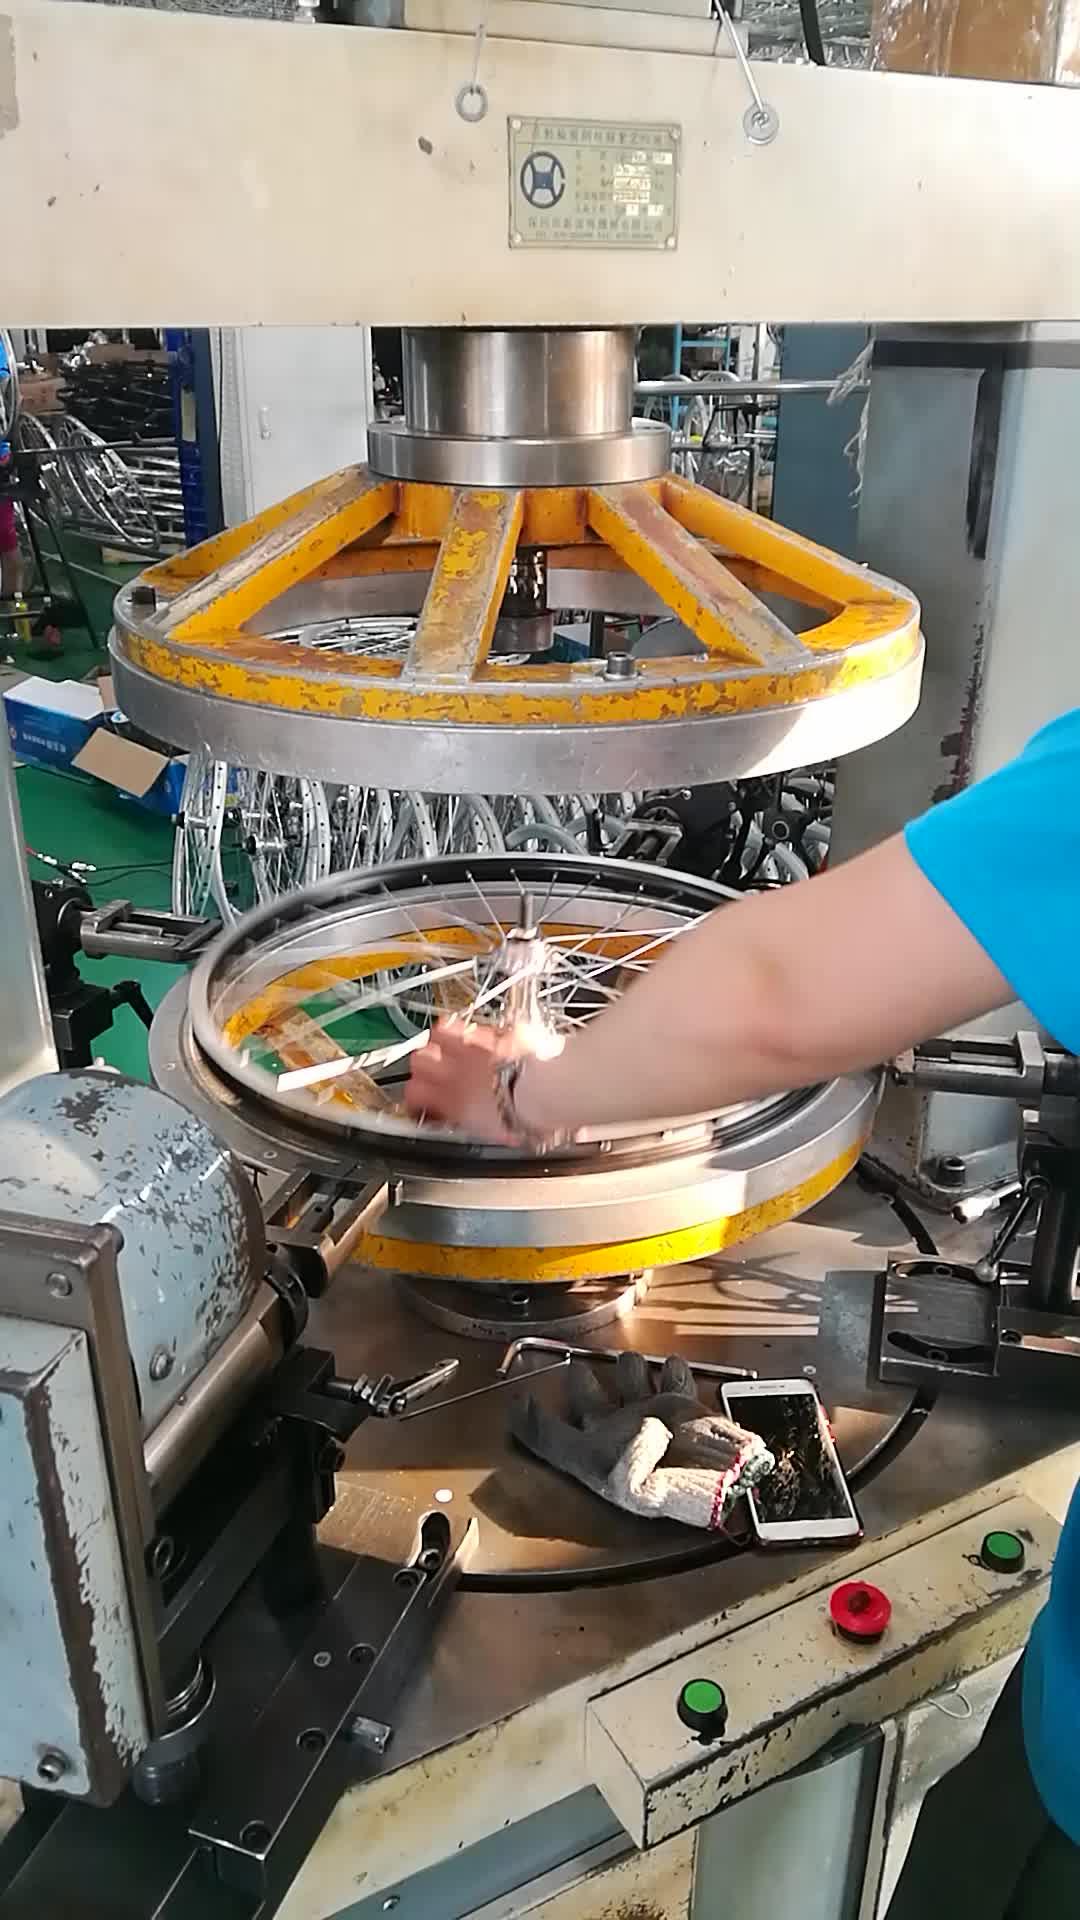 Tianjin fabricant 700C x 23C Kenda pneu en alliage d'aluminium cadre 14 sports de vitesse de course vélo de route